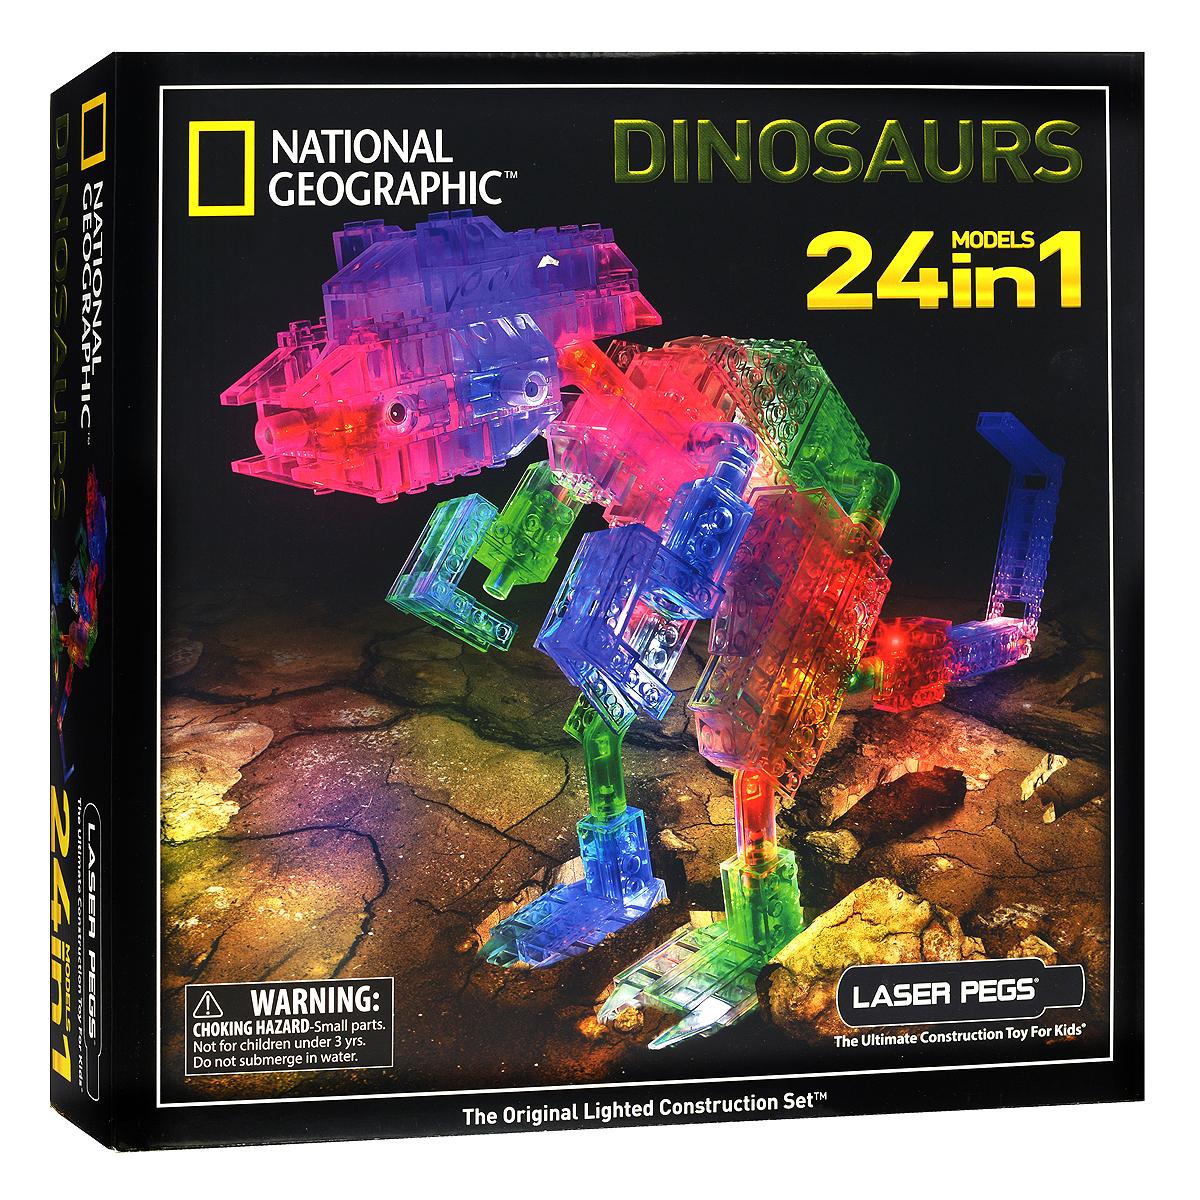 Laser Pegs Конструктор Динозавры 24 в 1  laser pegs конструктор динозавры 24 в 1